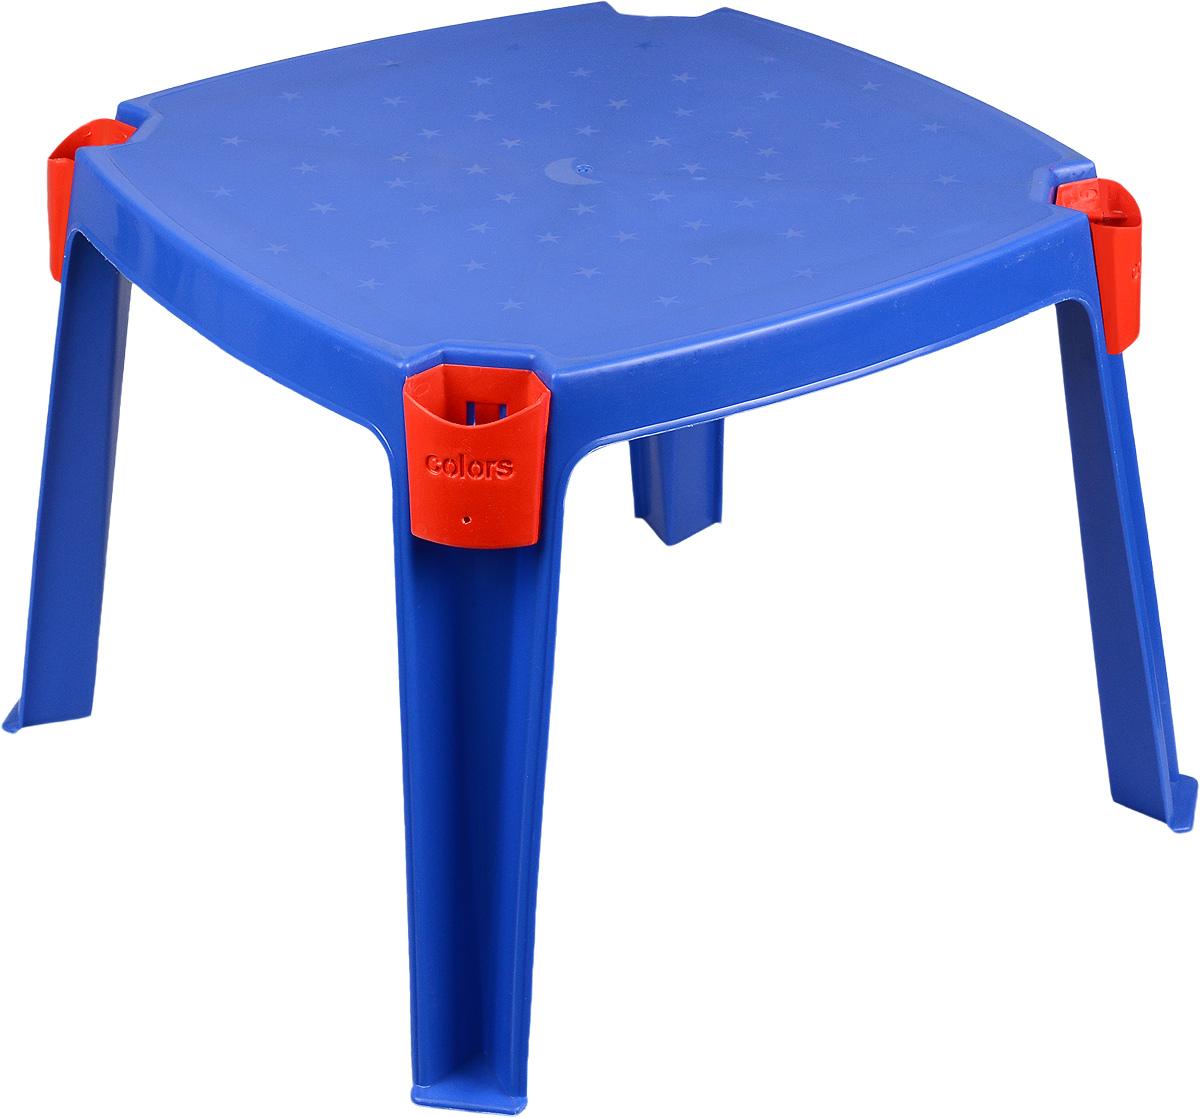 Marian Plast Стол детский с карманами 53 см х 53 см цвет синий